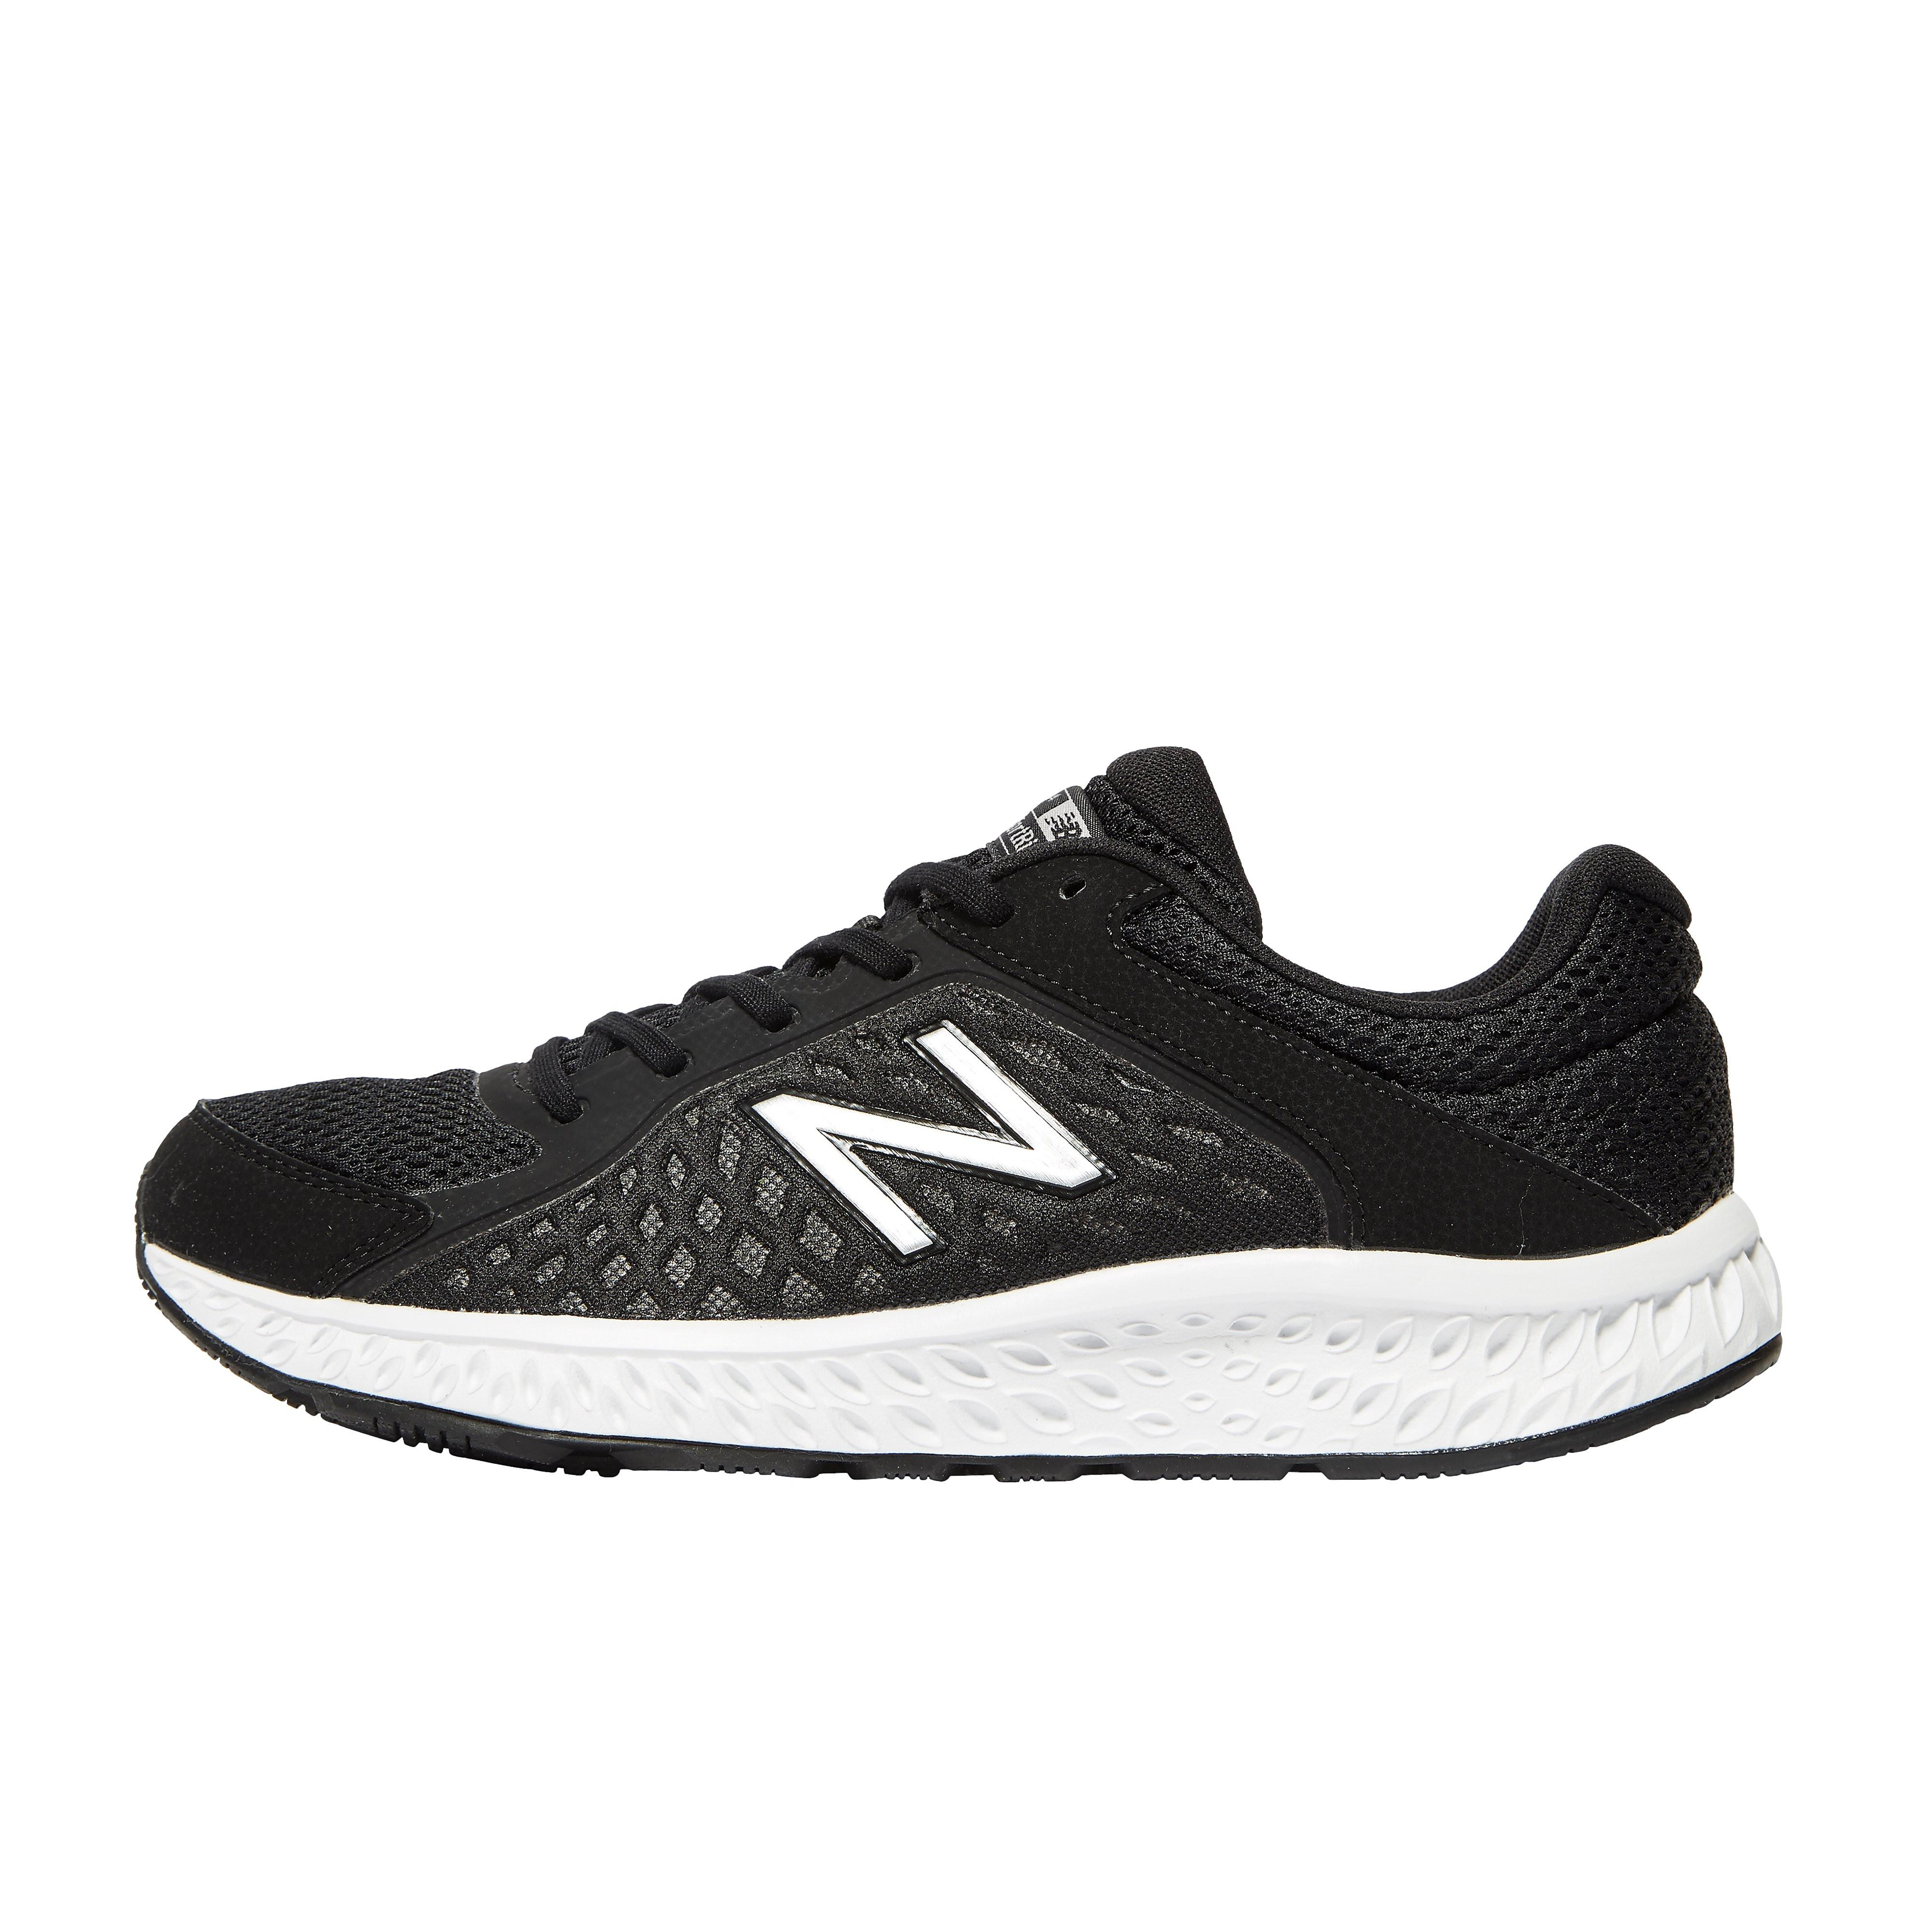 New Balance M420v4 Women's Running Shoes